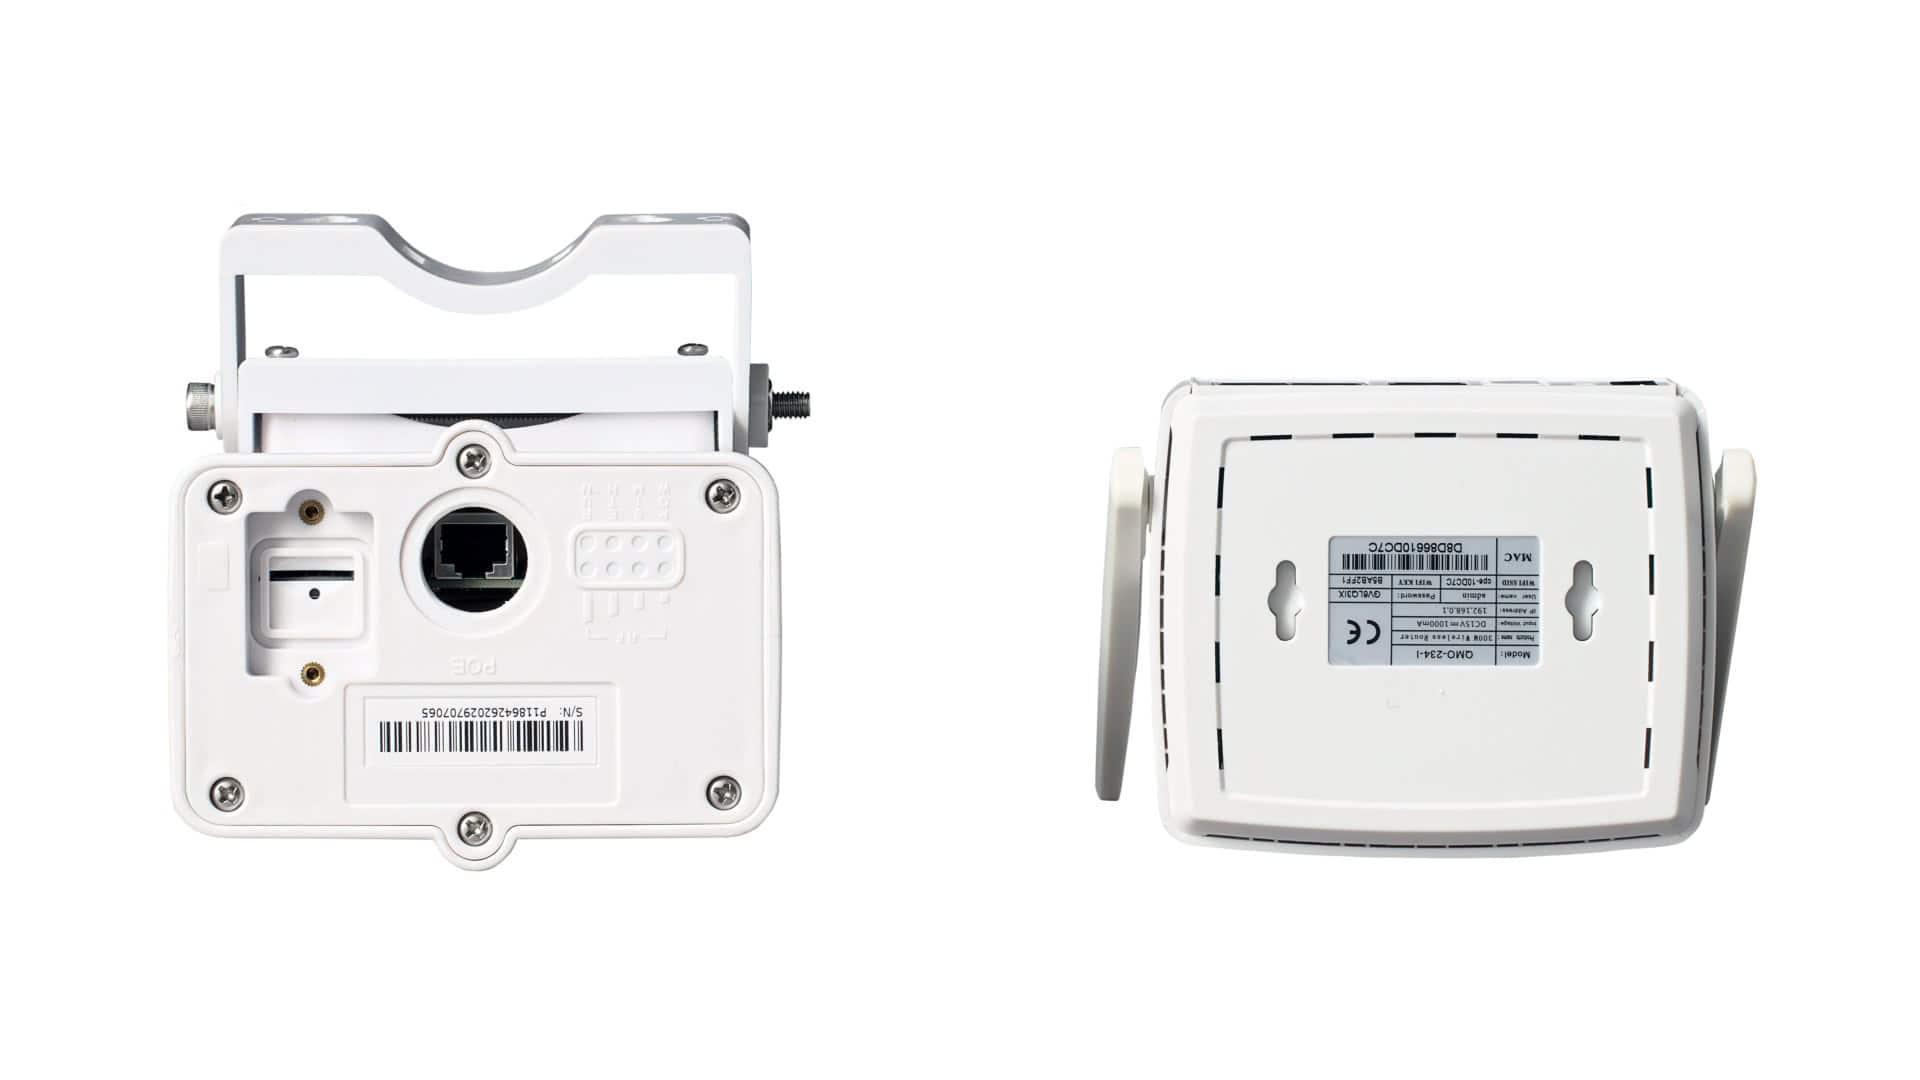 Qtech QMO-234 (3G/4G маршрутизатор с внешним модулем и Wi-Fi, LTE роутер)